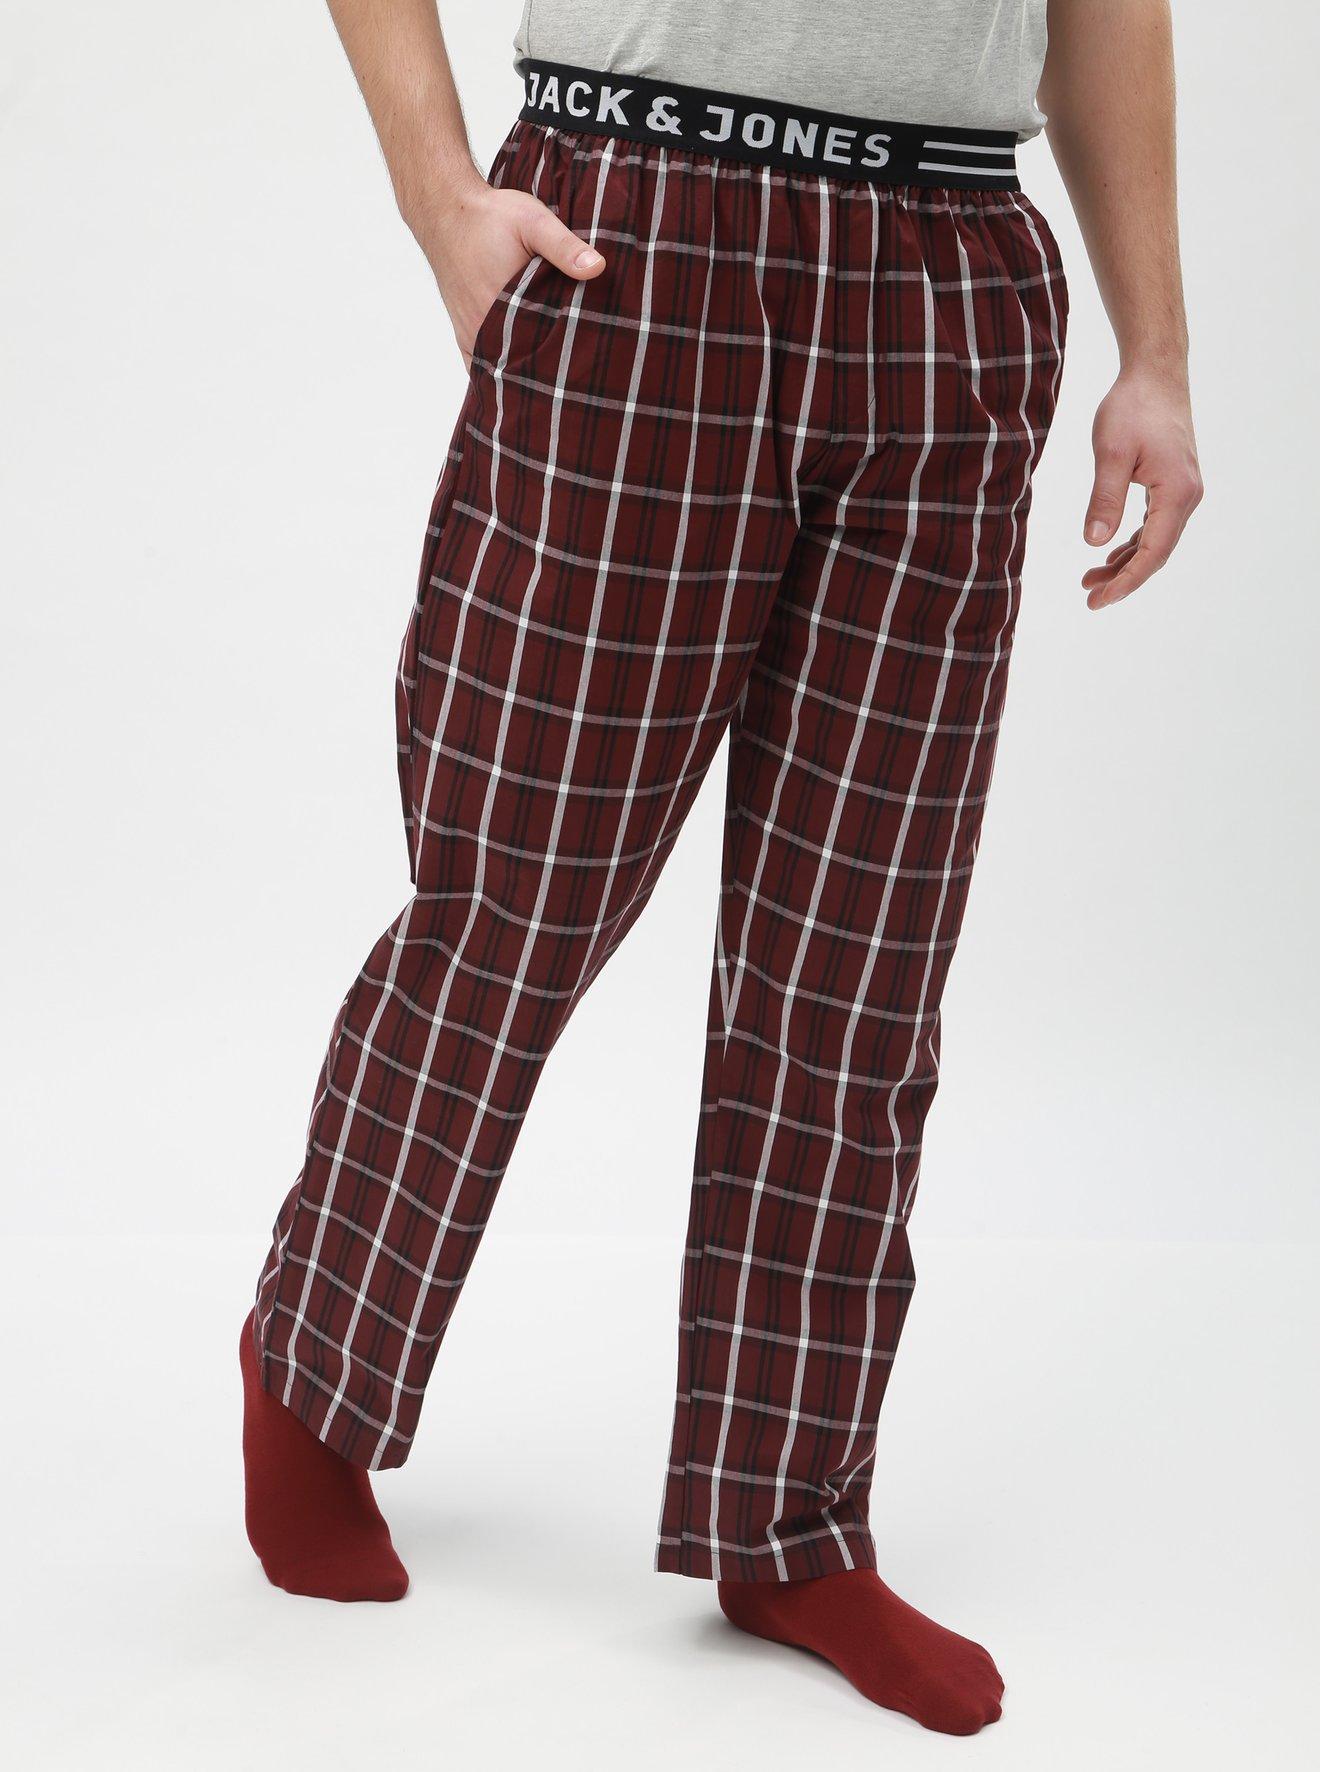 Vínové kostkované pyžamové kalhoty Jack & Jones